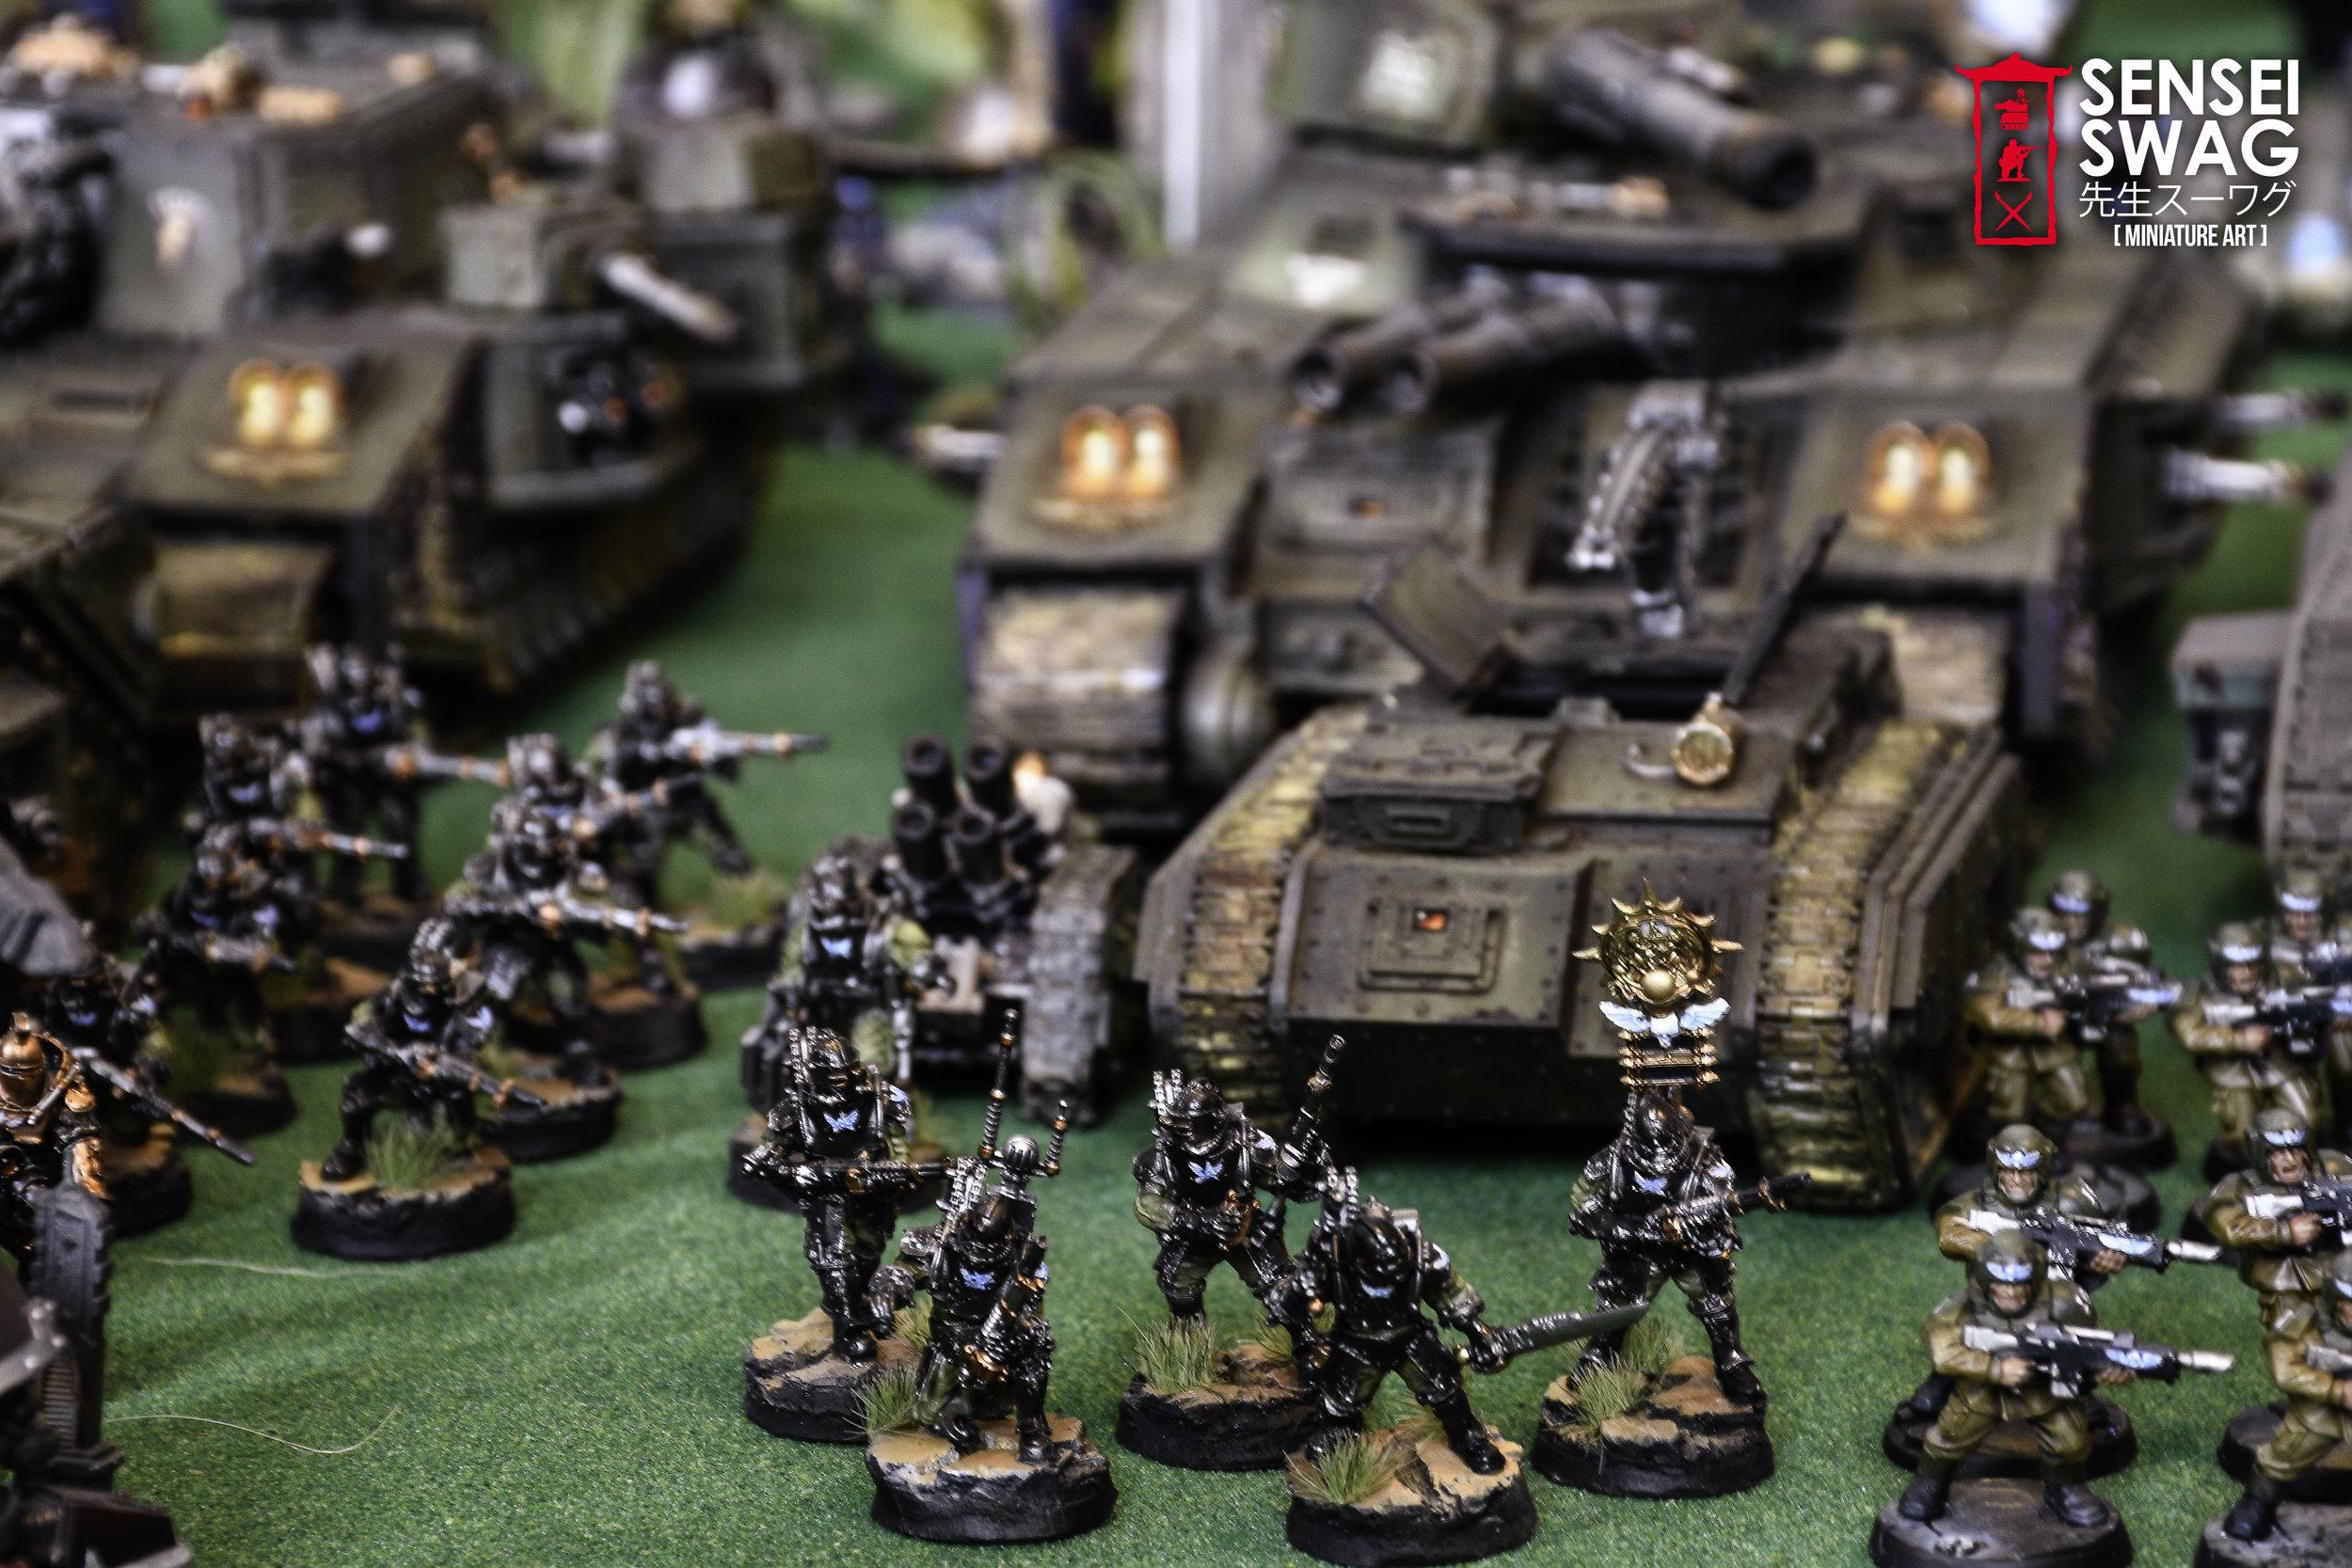 Biggest 40k Apocalypse Army Warlord Titan Maniple-9.jpg